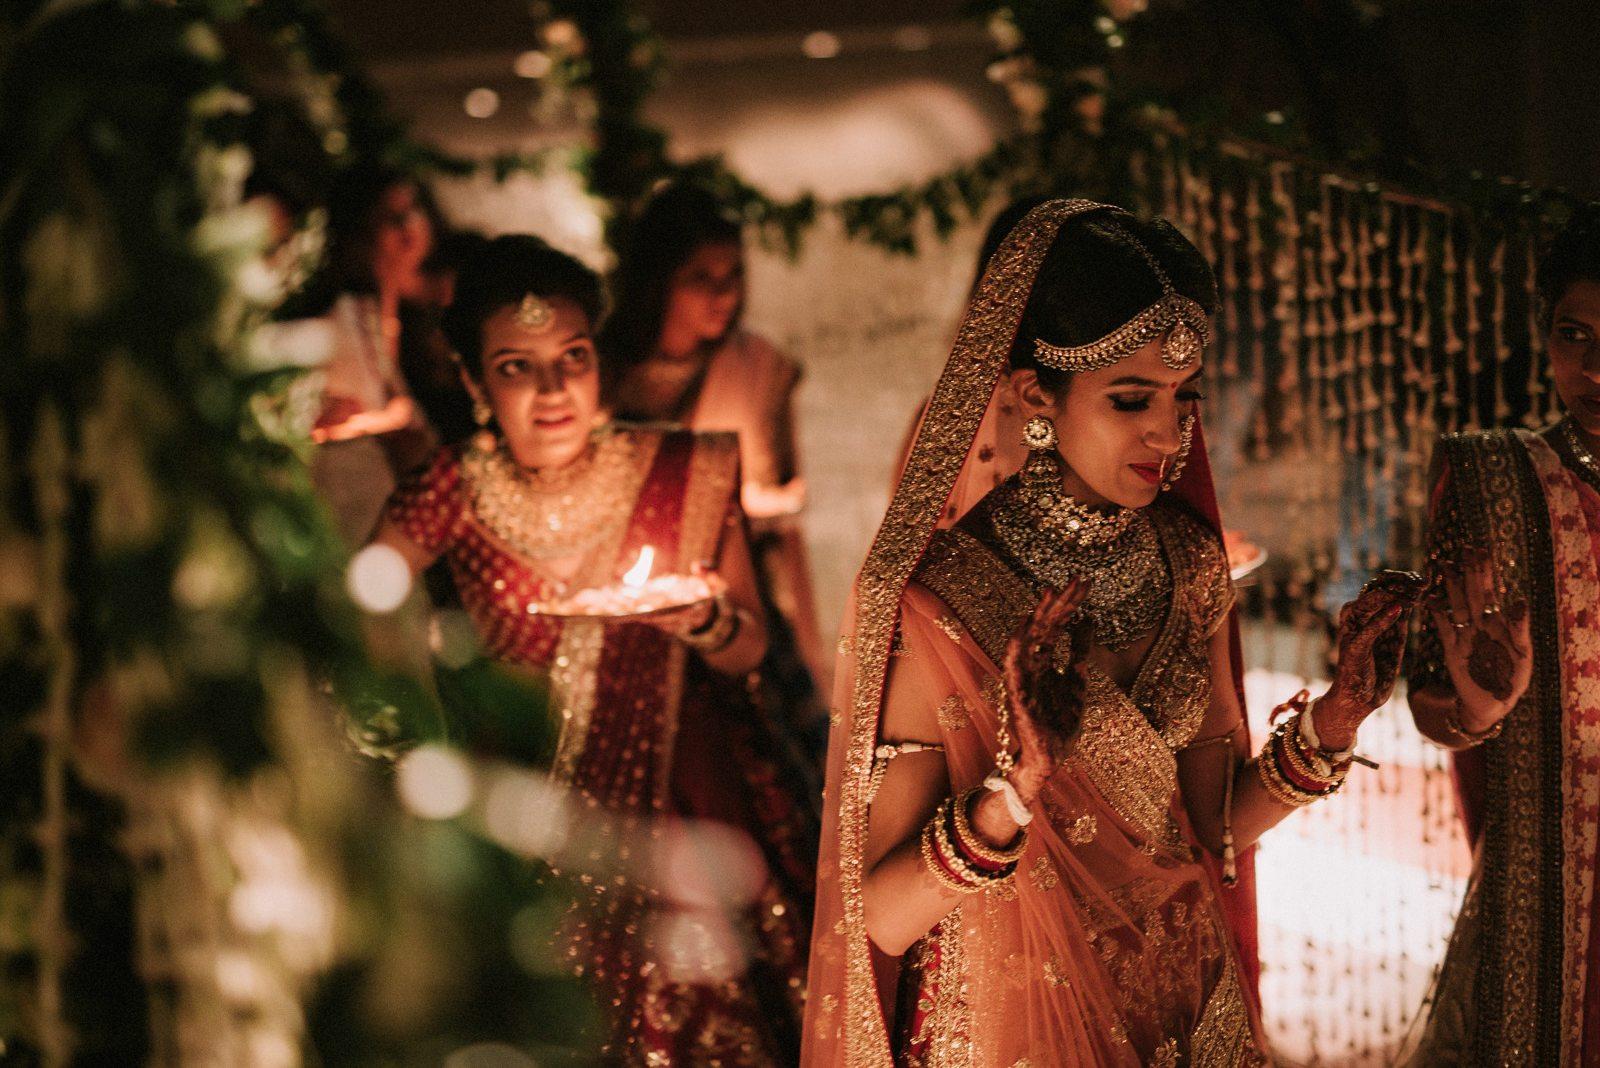 wedding in india - destination wedding photographer-255.jpg